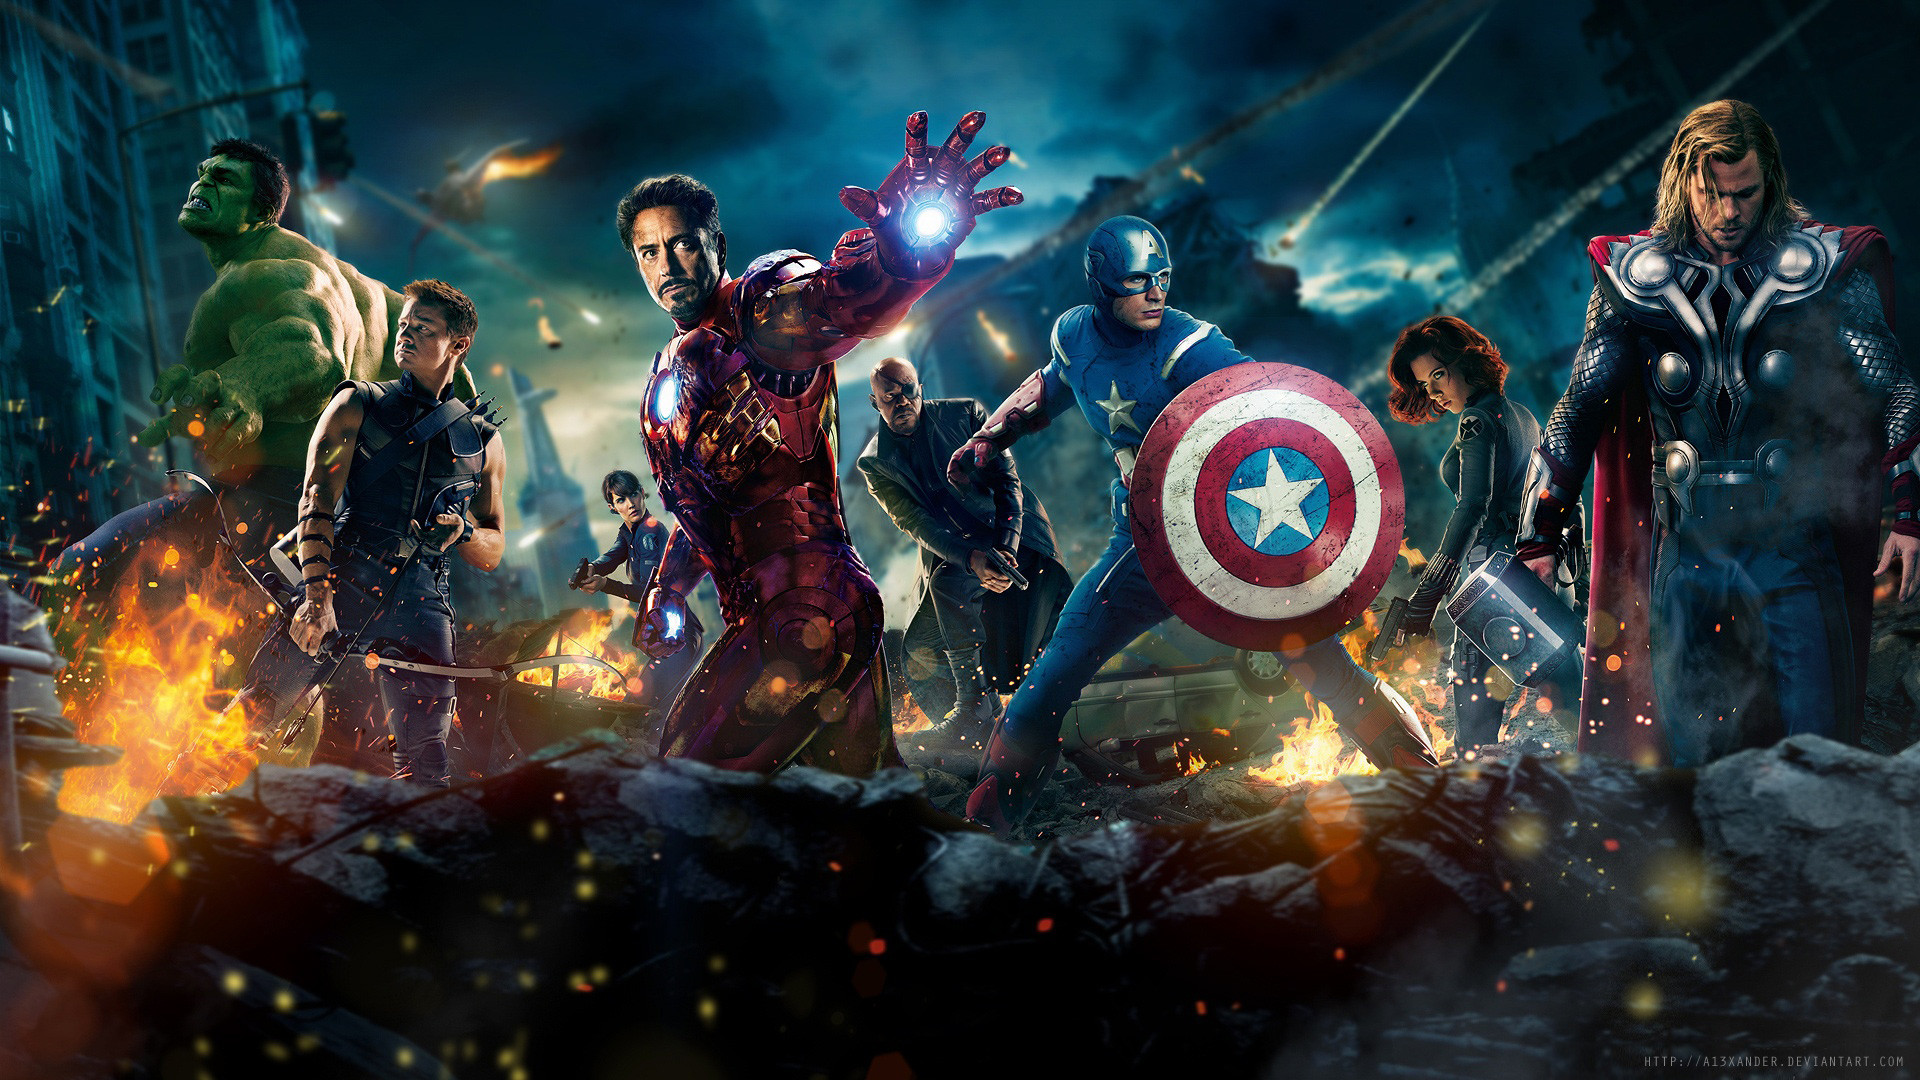 0 Cool HD Desktop Wallpapers Categories Download Iron Man  Avengers The Movie Full Wallpaper .